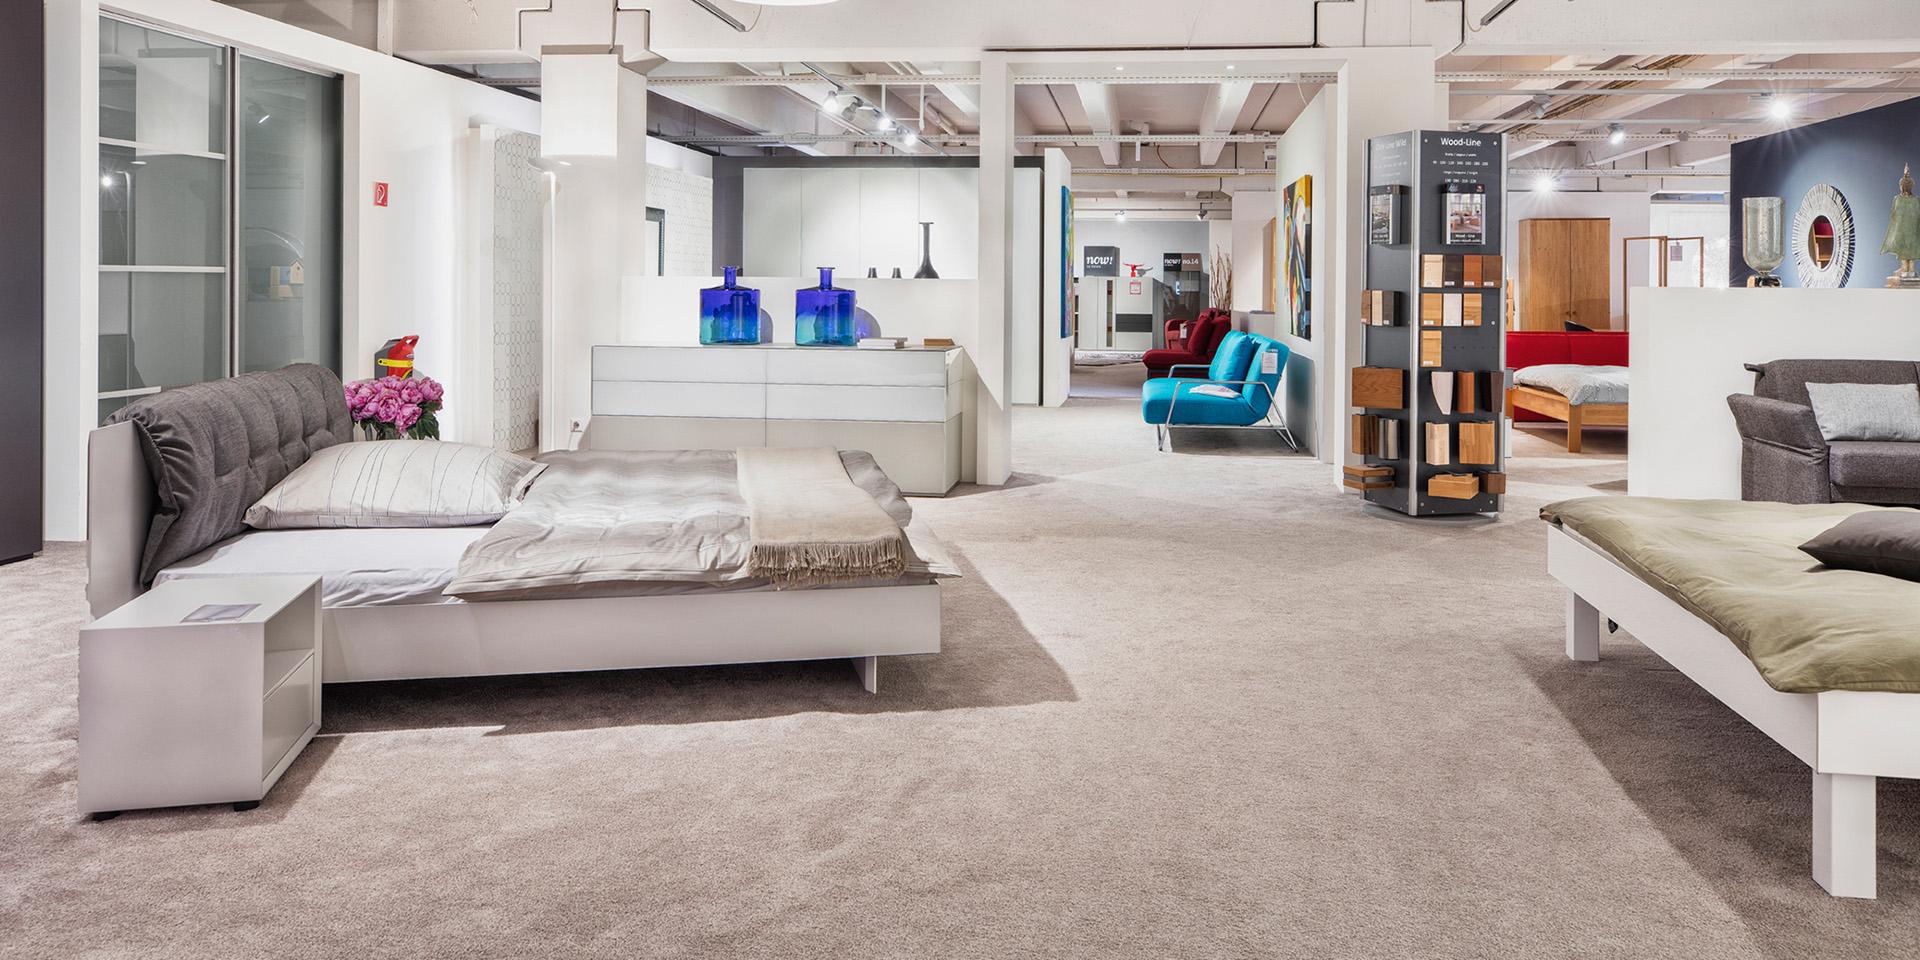 web foto8989 final schmal fenchel wohnfaszination gmbh. Black Bedroom Furniture Sets. Home Design Ideas